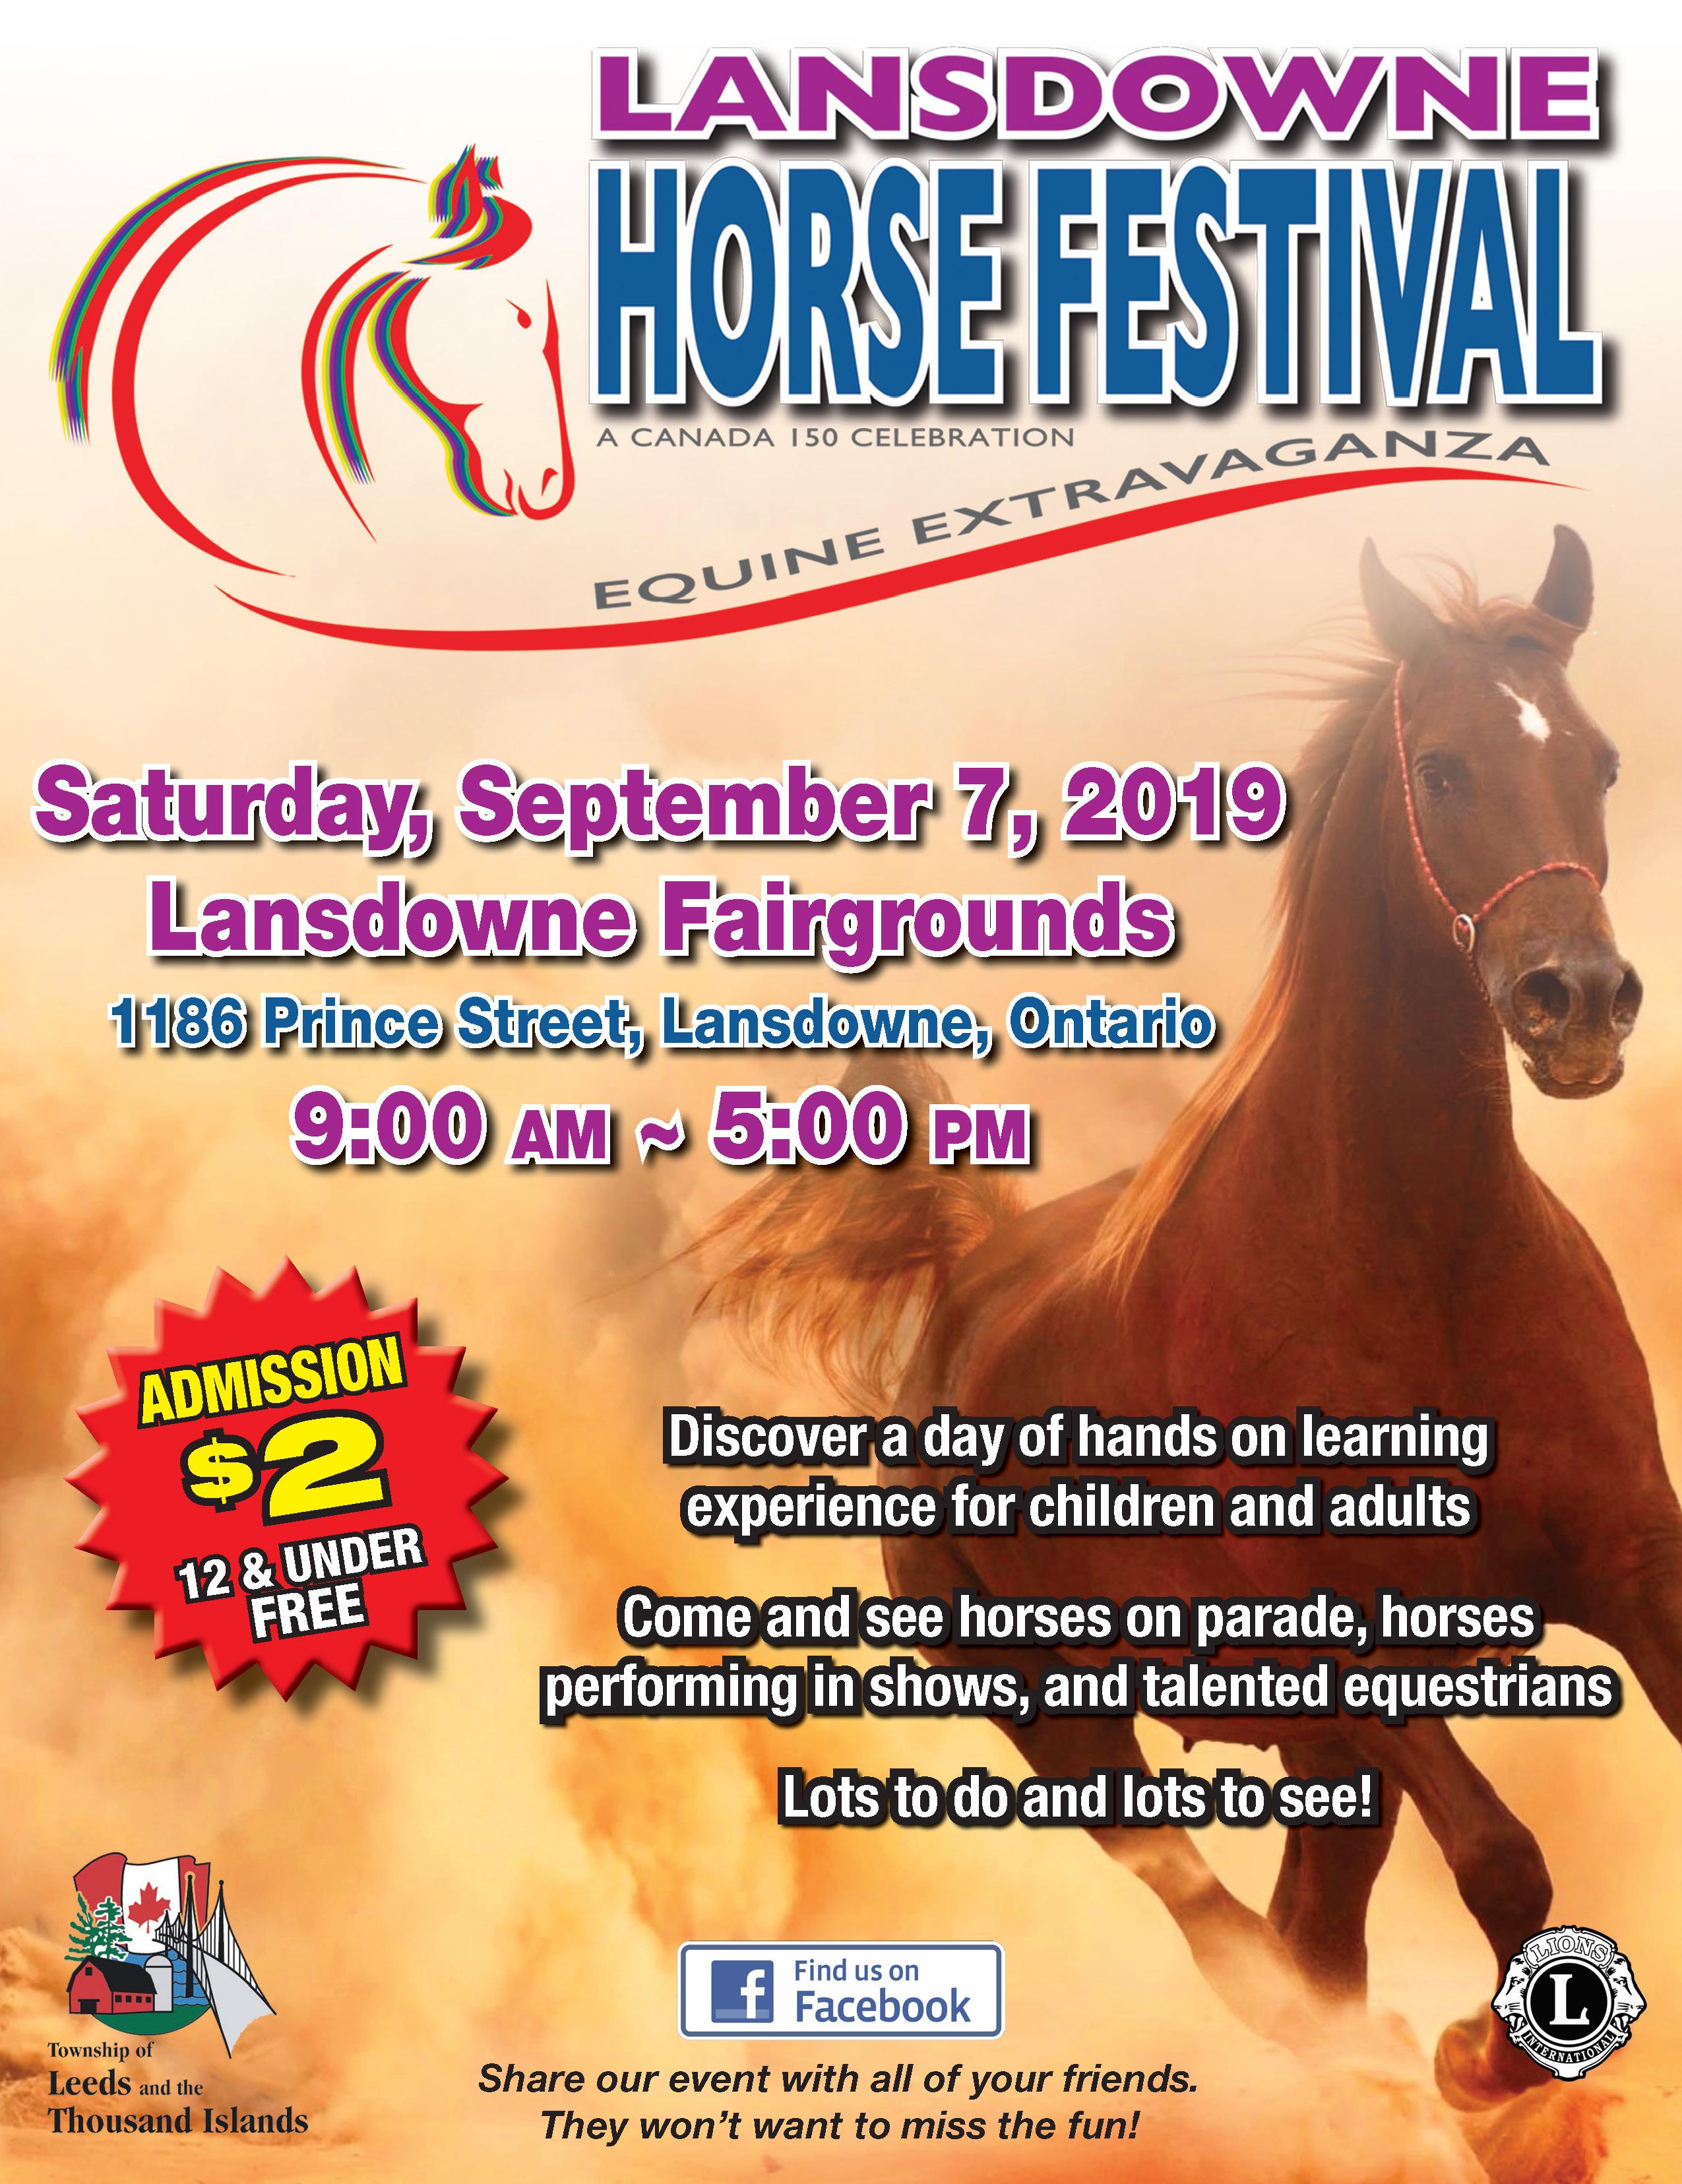 Lansdowne Horse Festival 2019